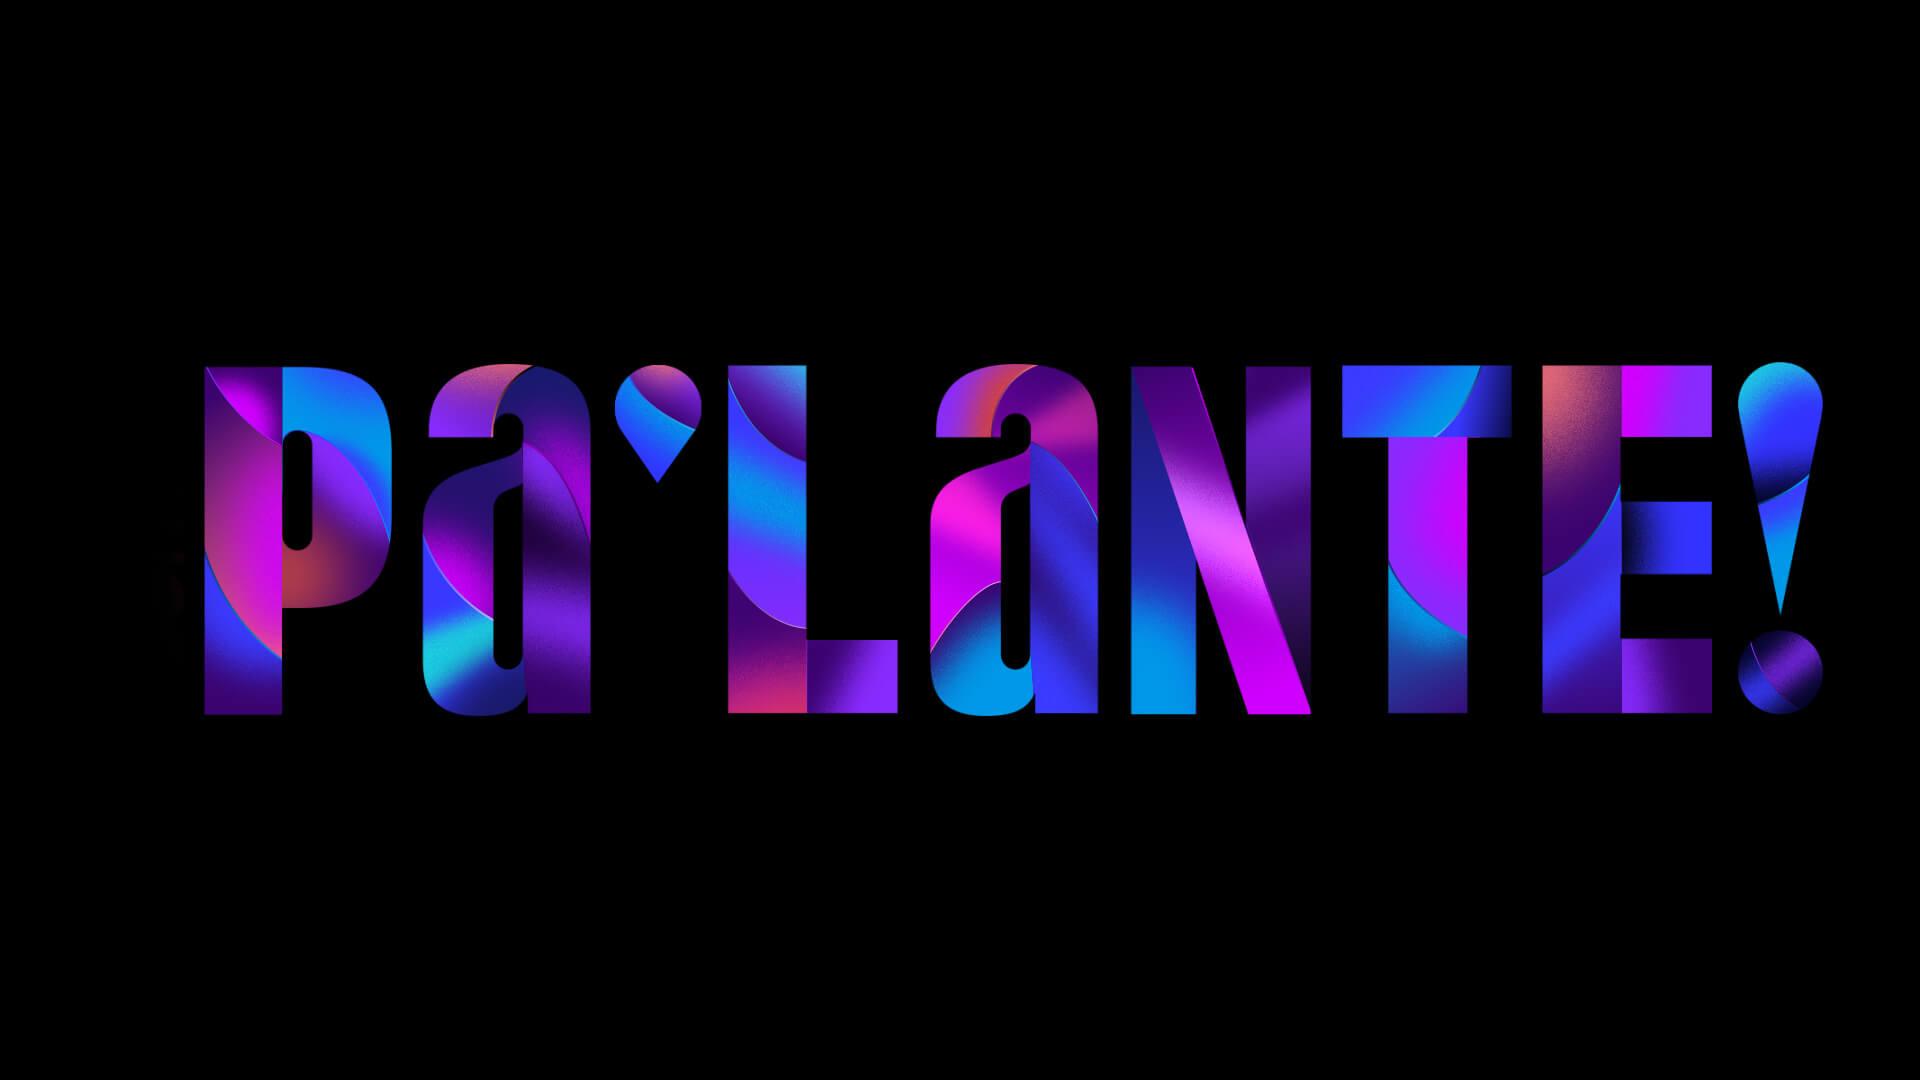 Palante_LogoTreatment_v01-2020-08-25